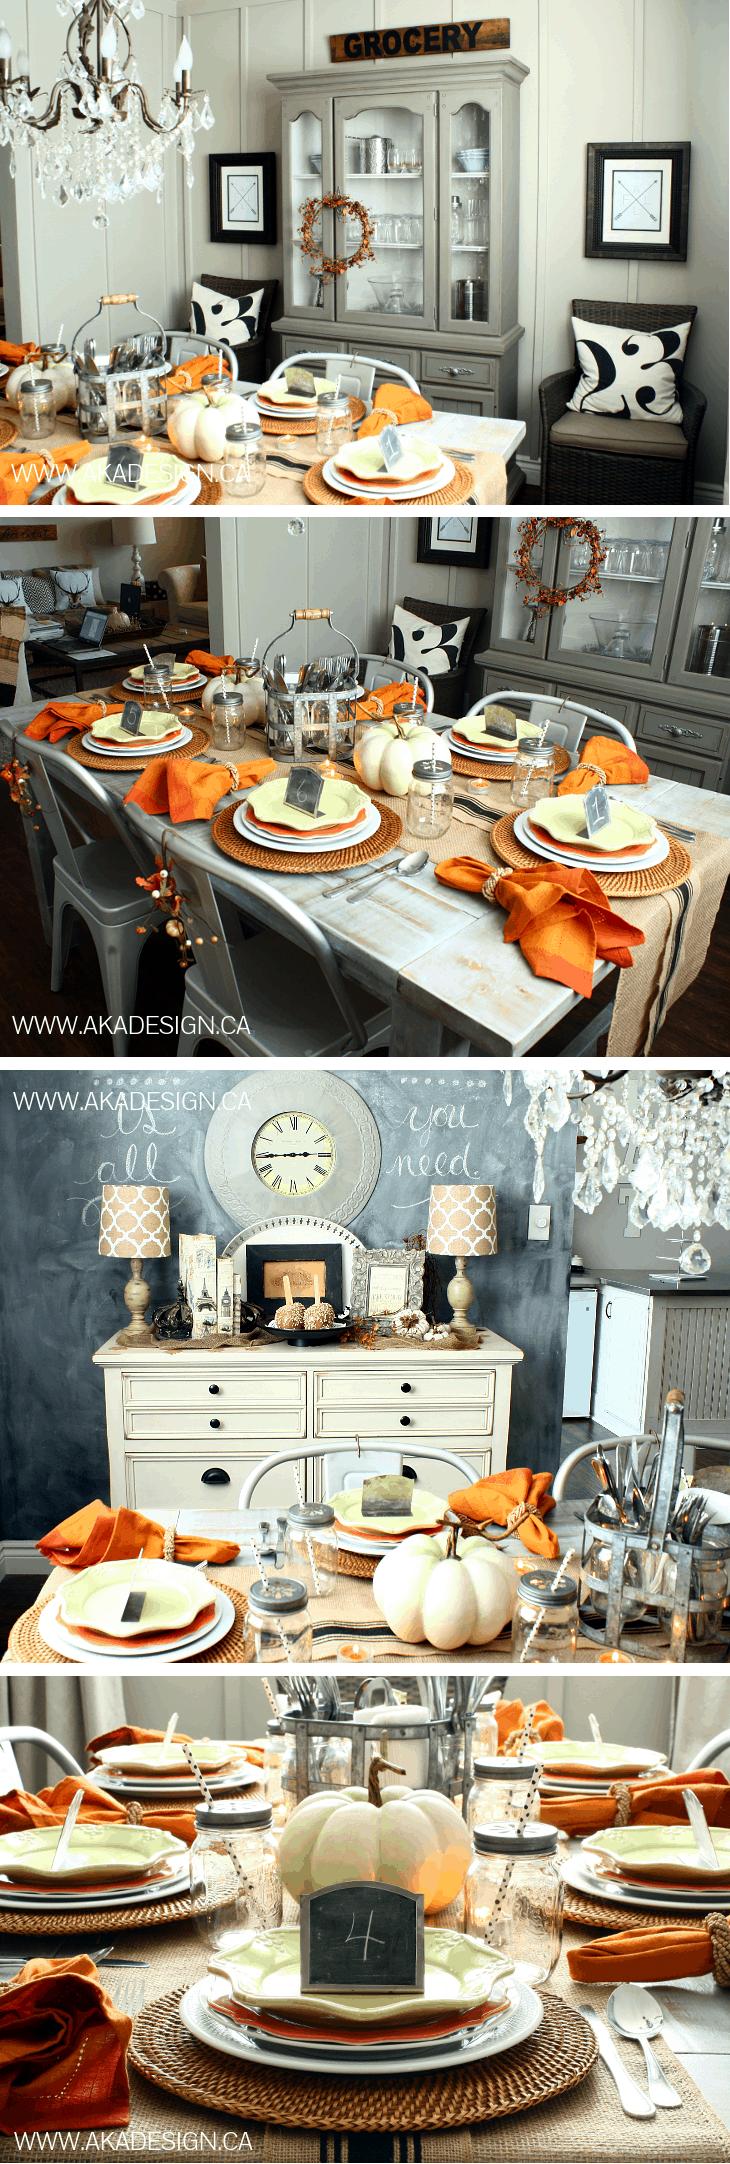 early fall dining room aka design